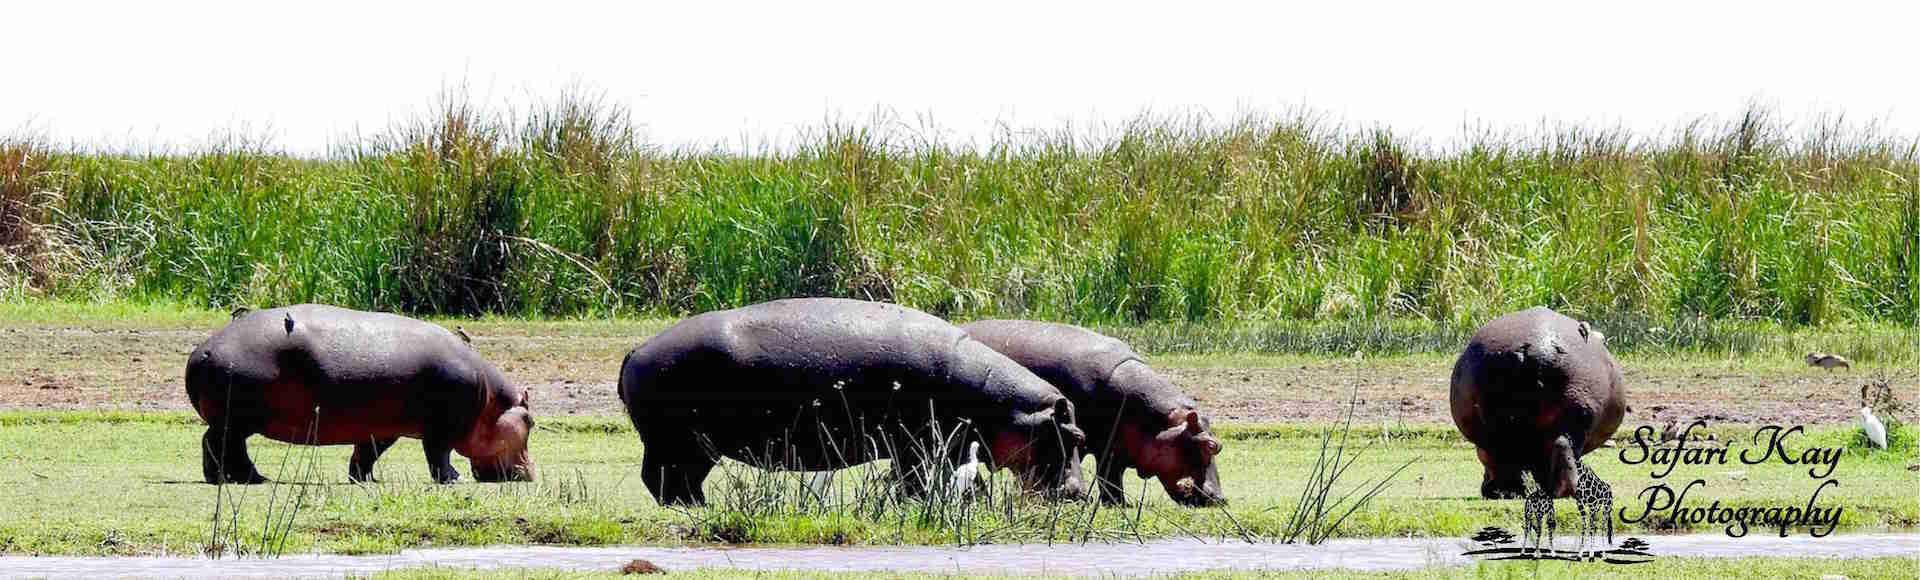 Hippos  lazily  grazing